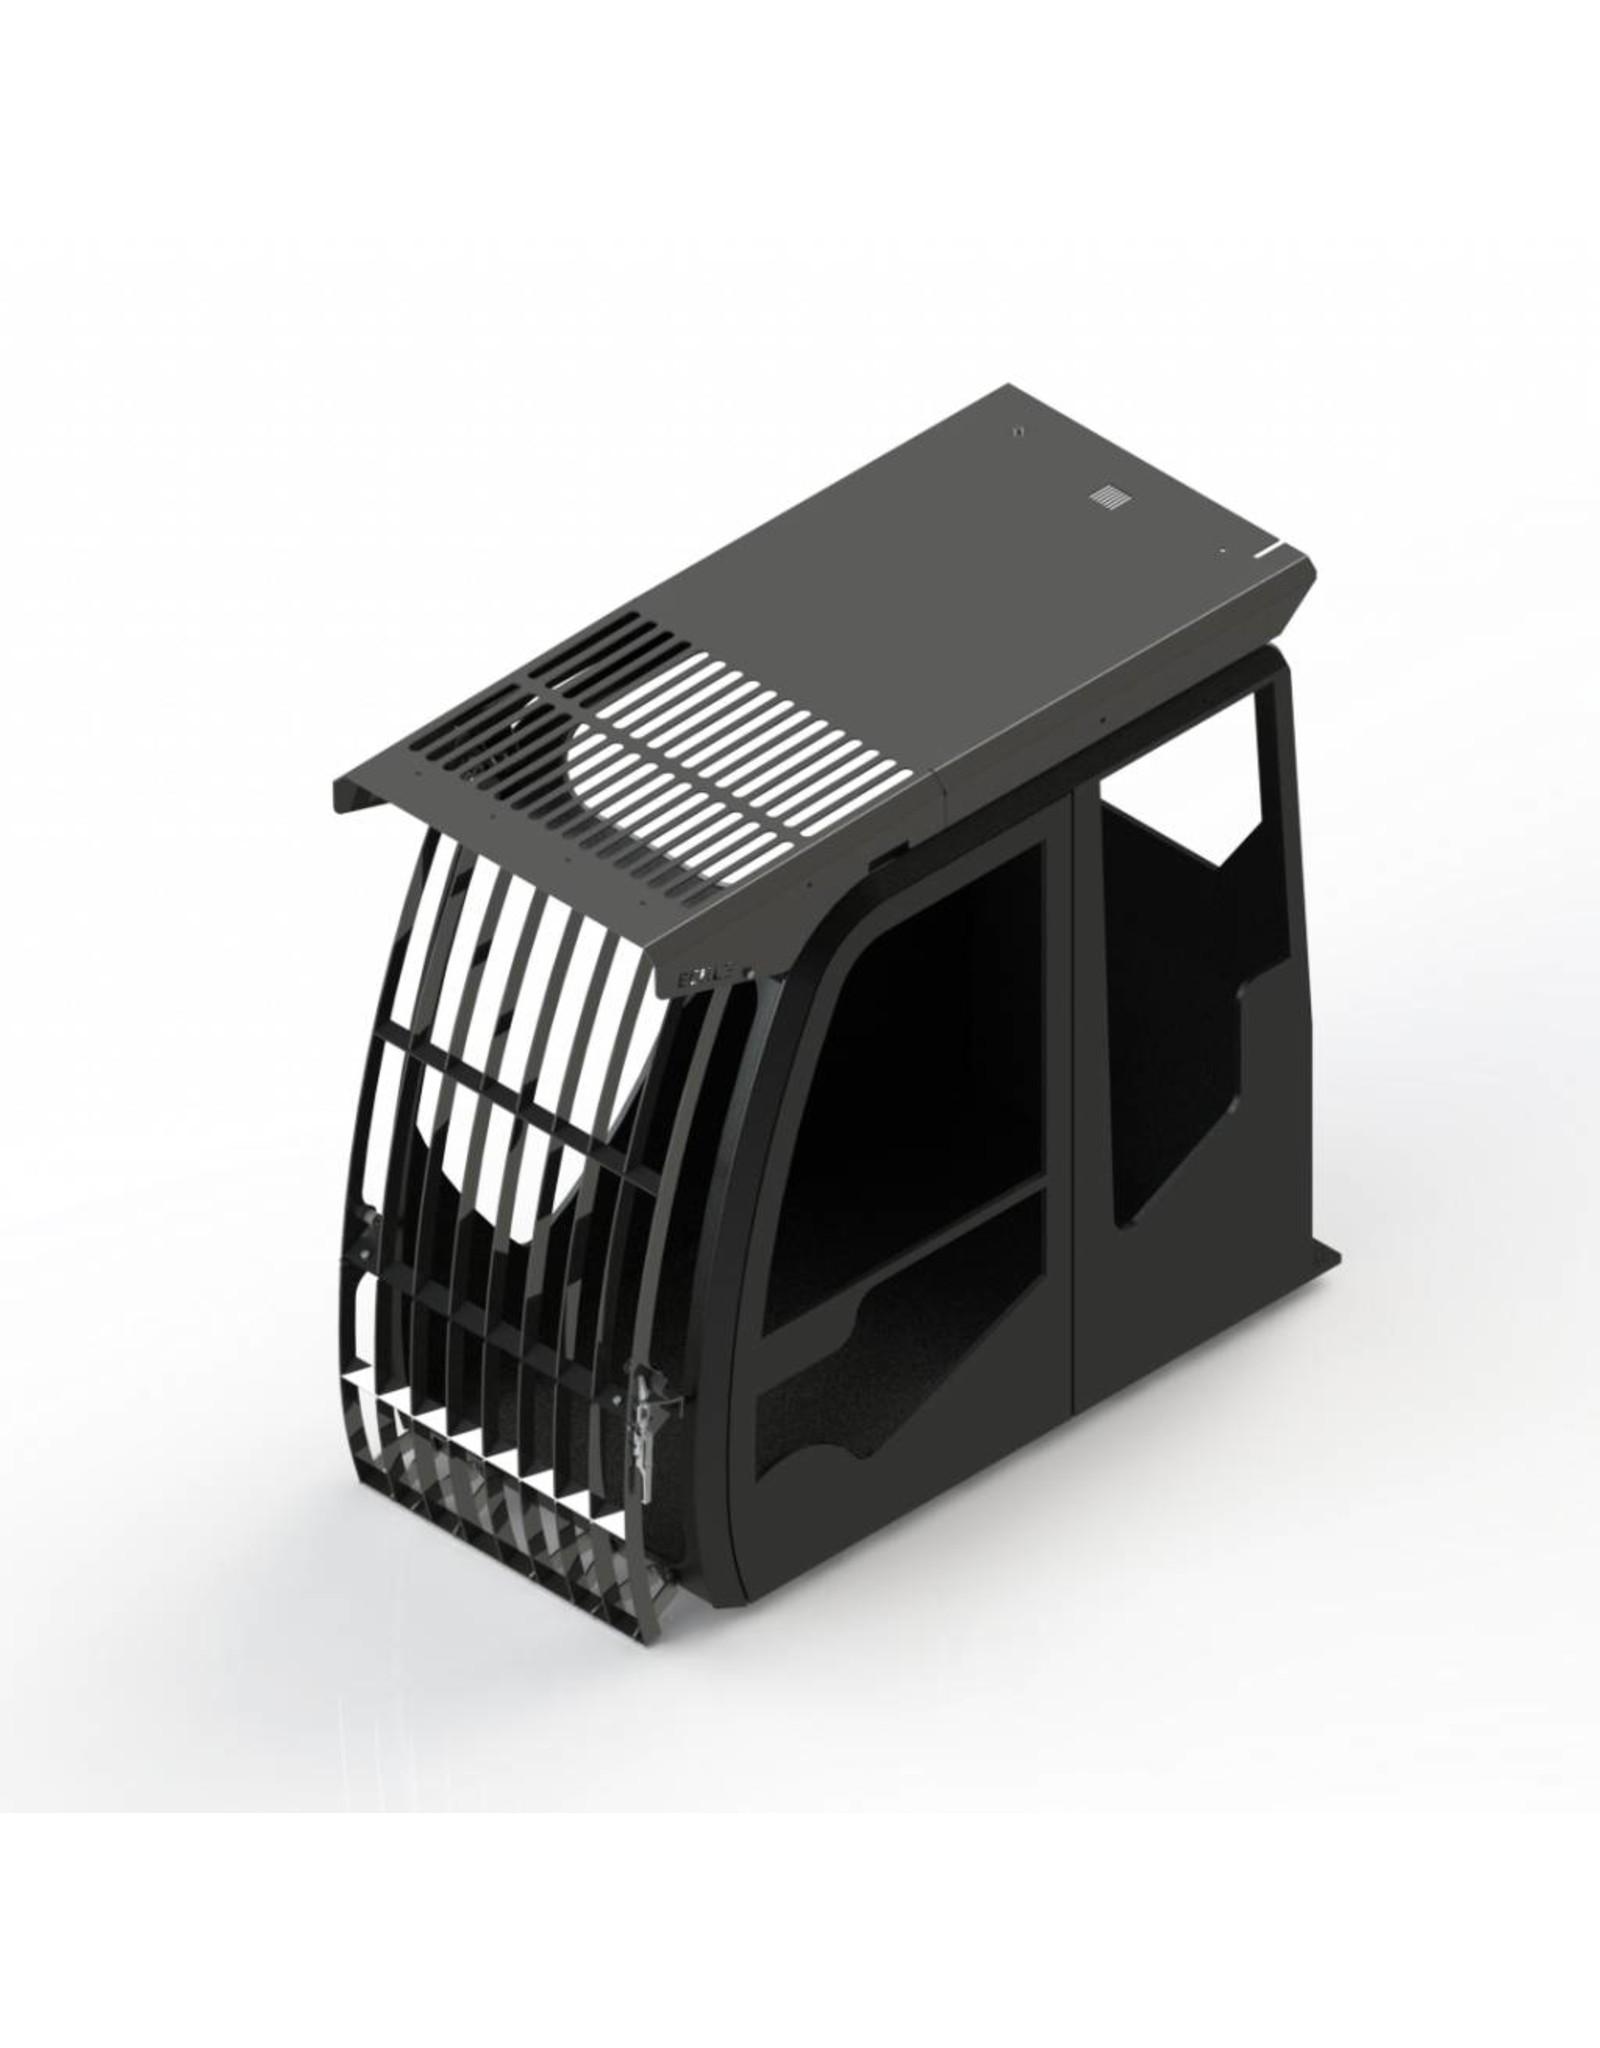 Echle Hartstahl GmbH FOPS pour Komatsu PC138US-10/11